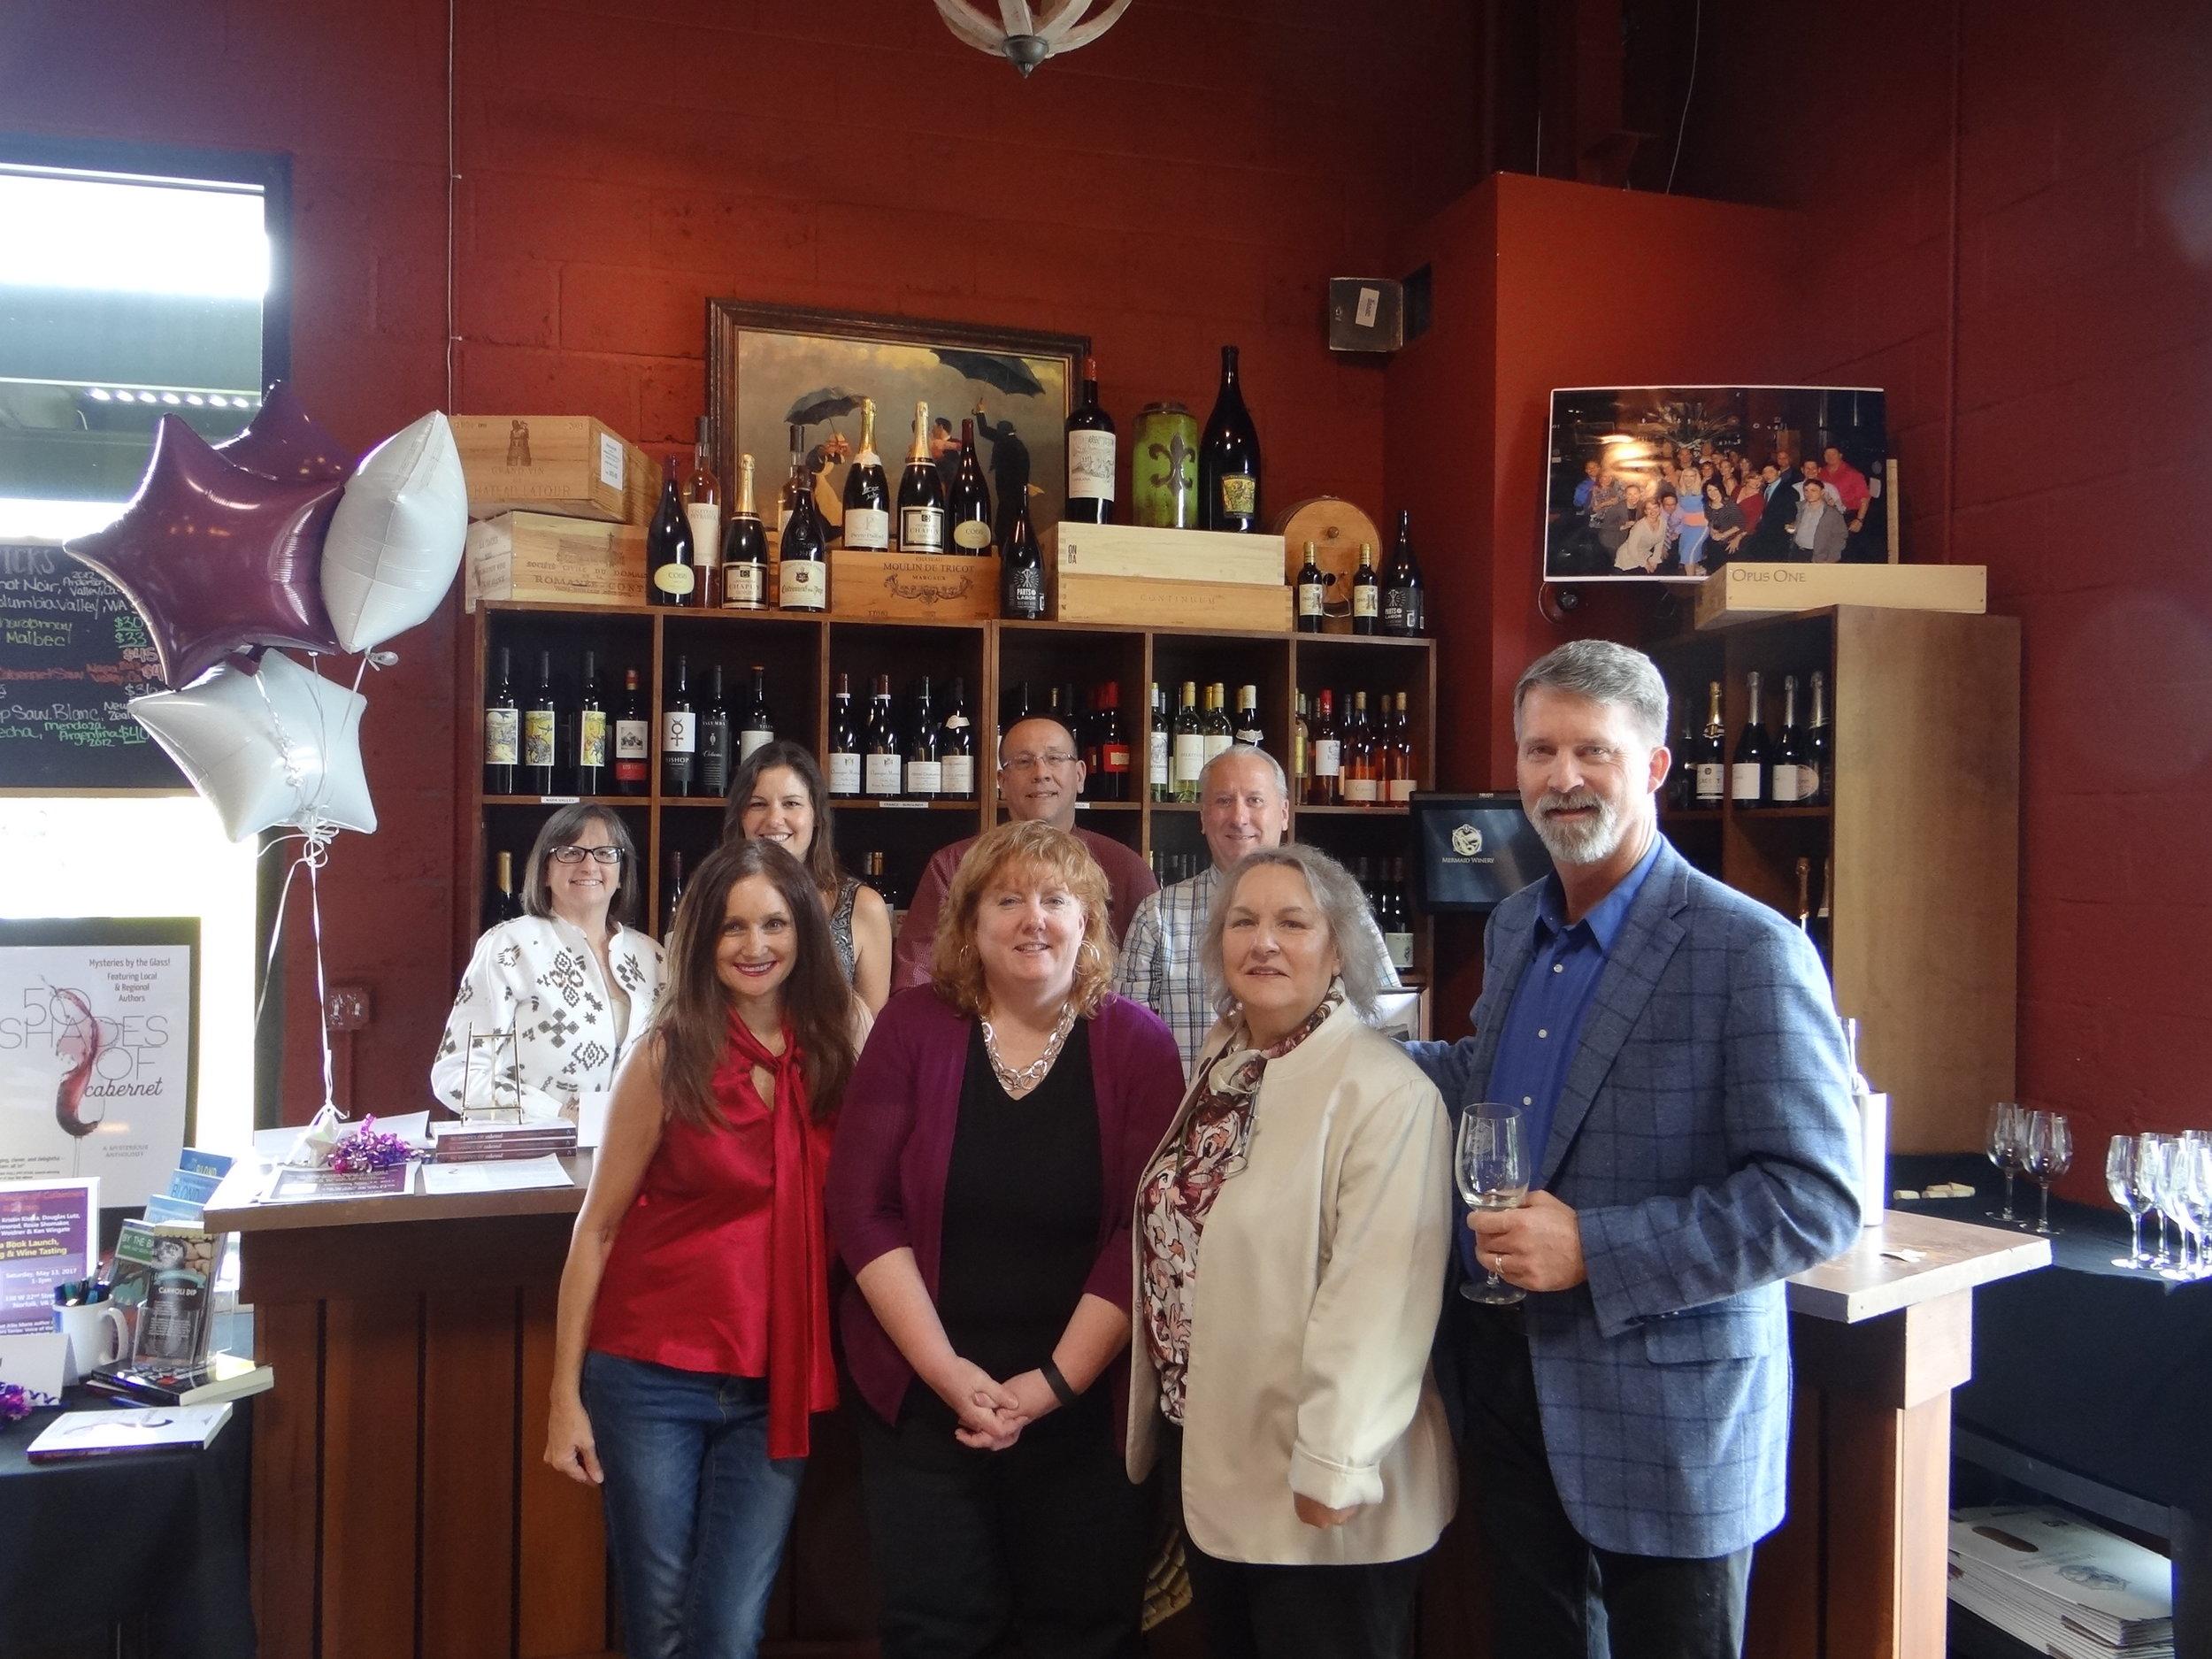 Back Row l-r: Jayne Ormerod, Kristin Kisska, DJ Lutz, Ken Wingate Front Row l-r: Teresa Inge, me, Rosemary Shomaker, and John Koehler